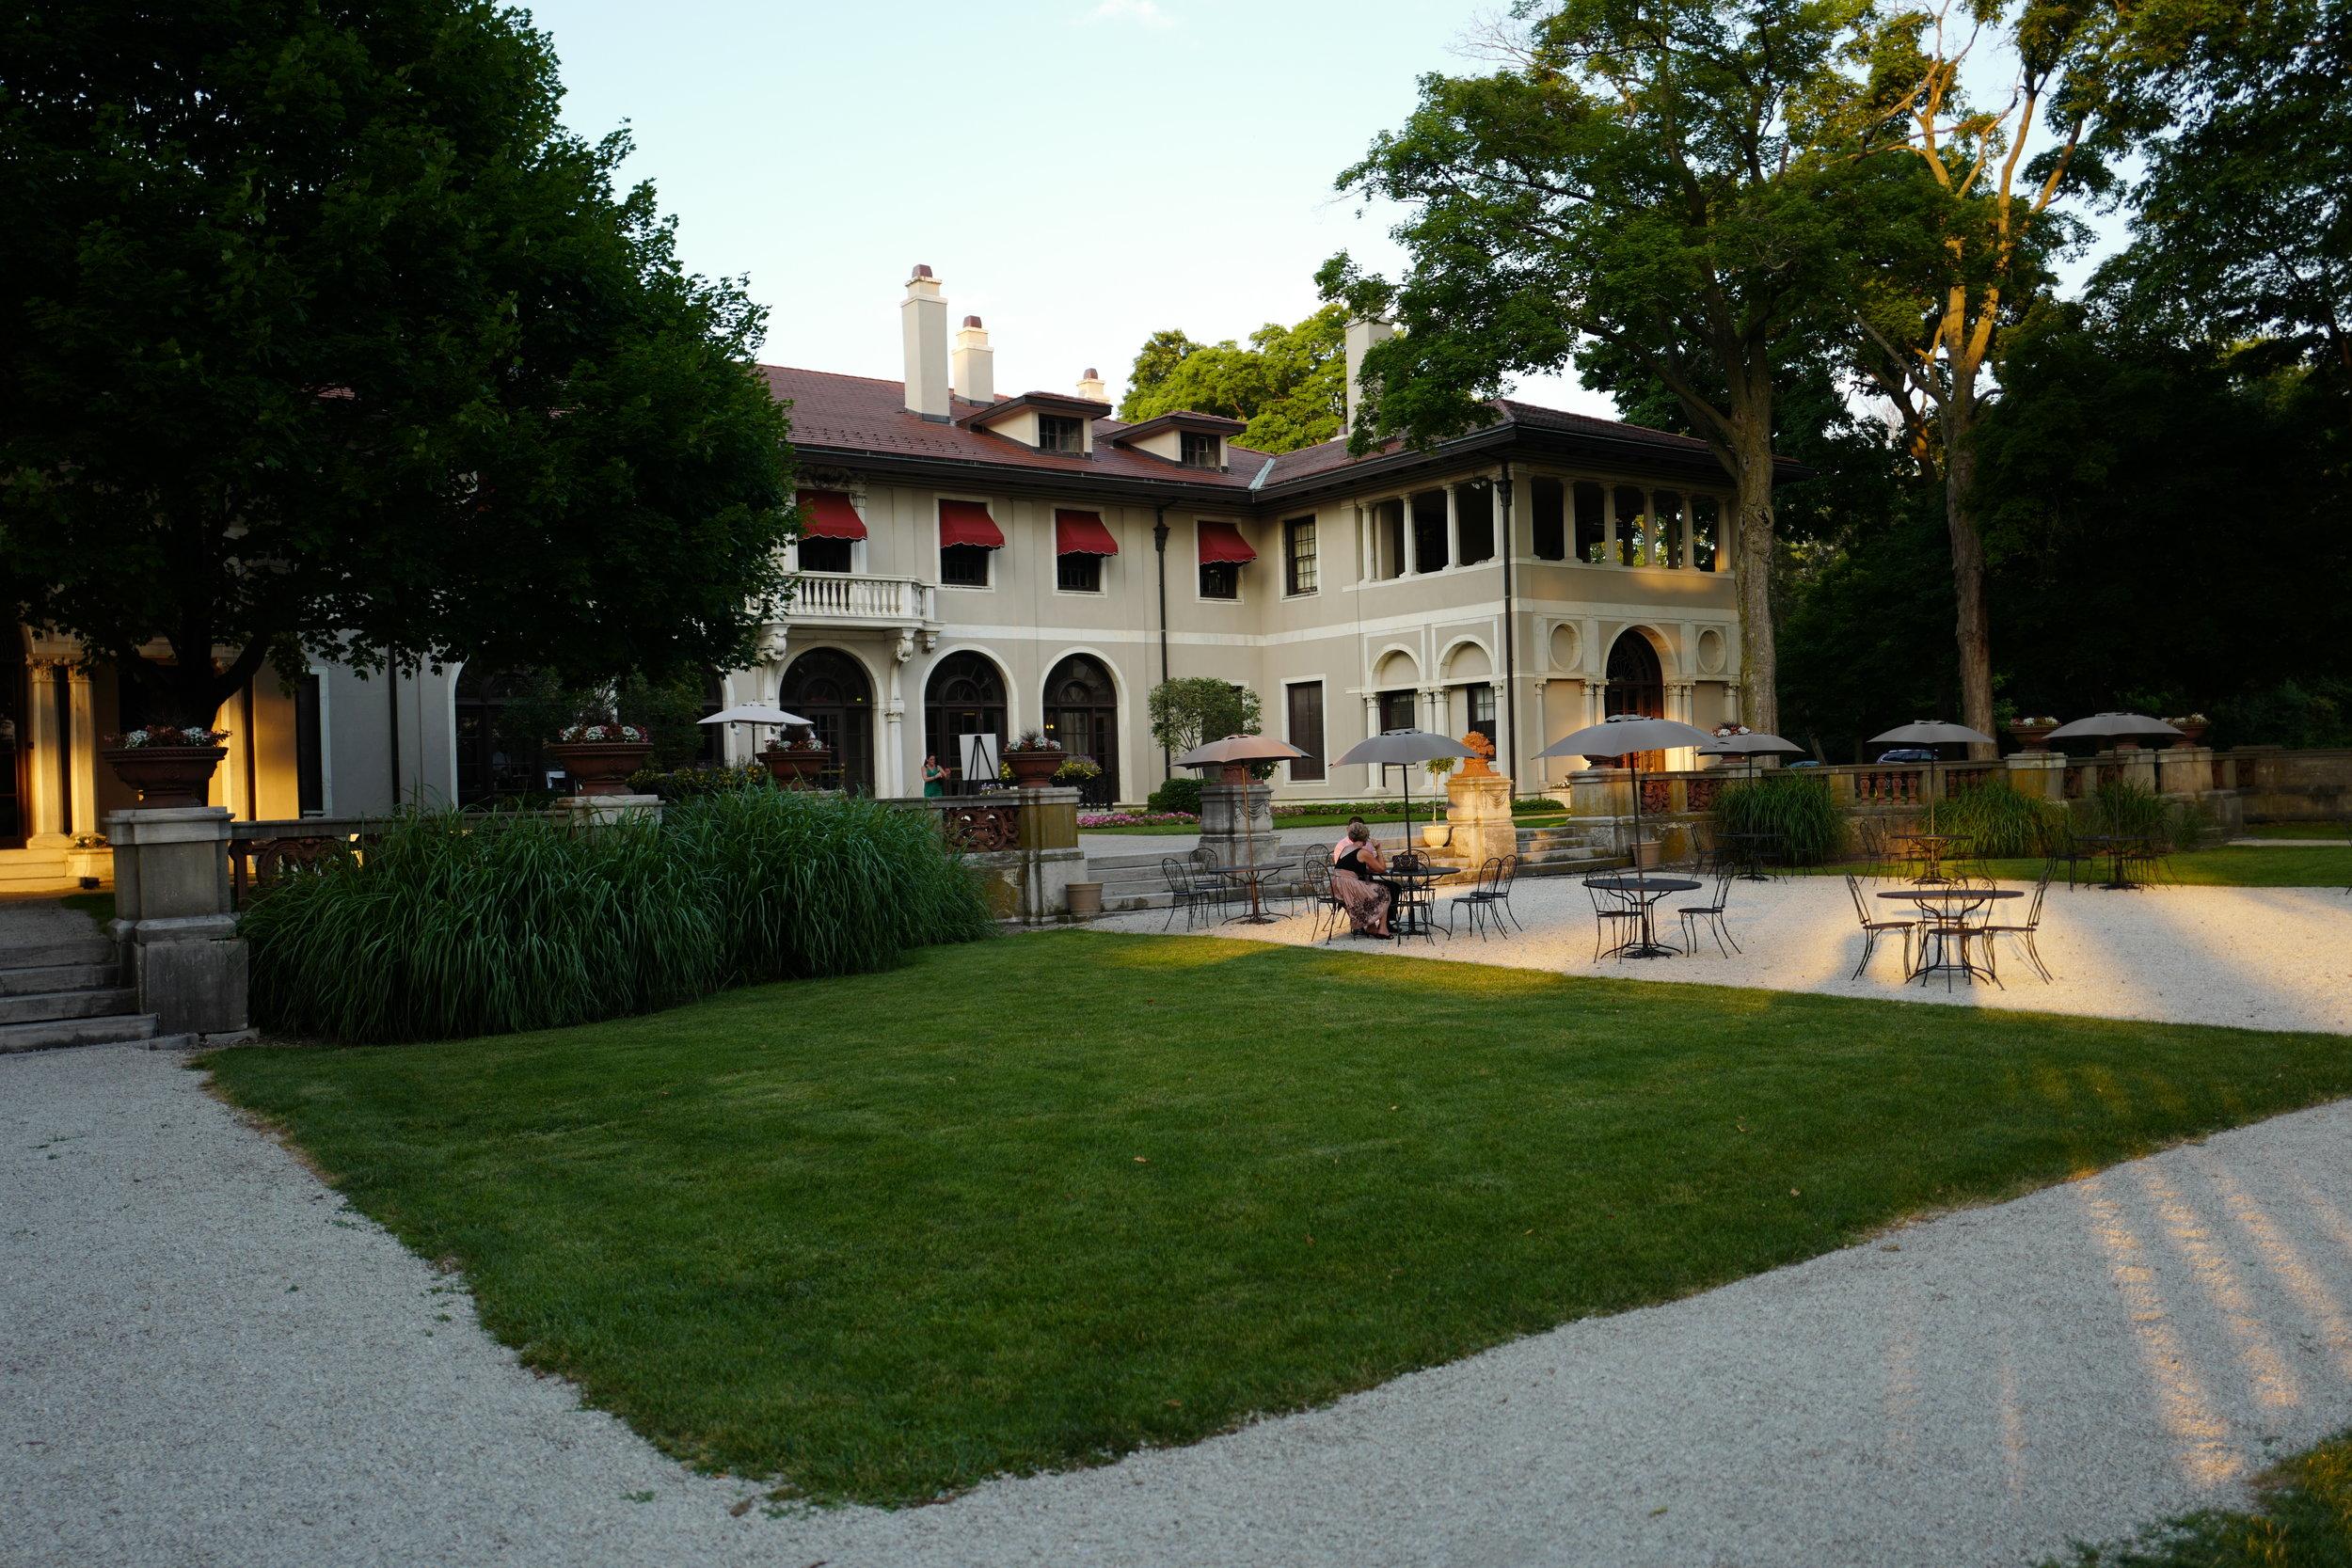 Backyard of the Armour House